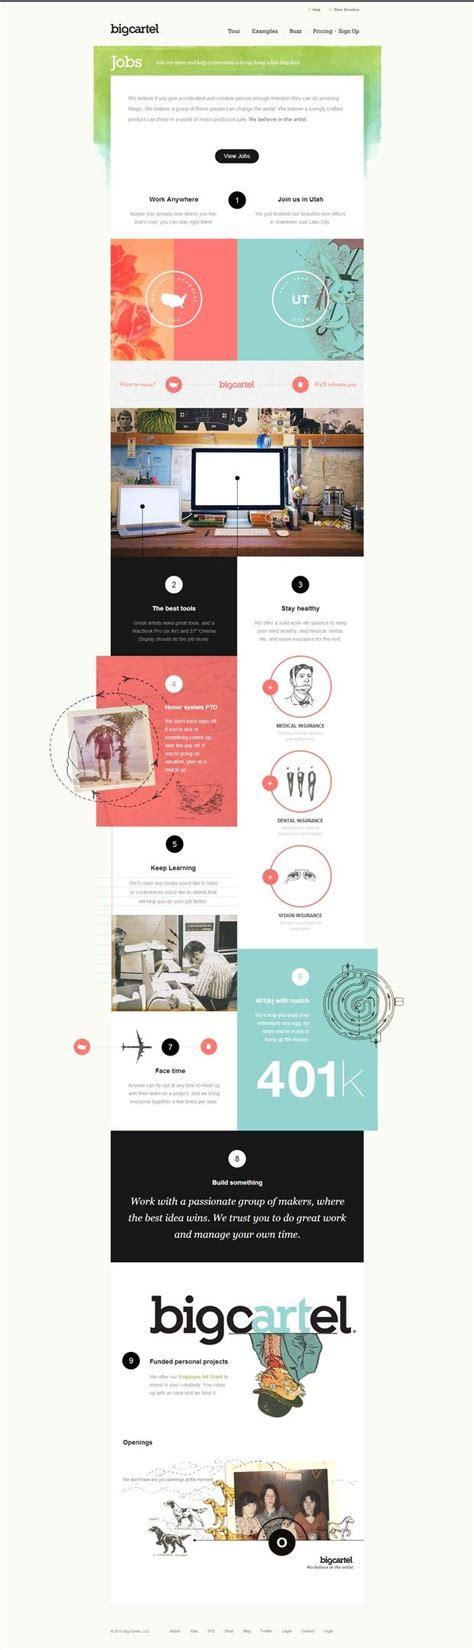 jobs layout design best 25 web design jobs ideas on pinterest web